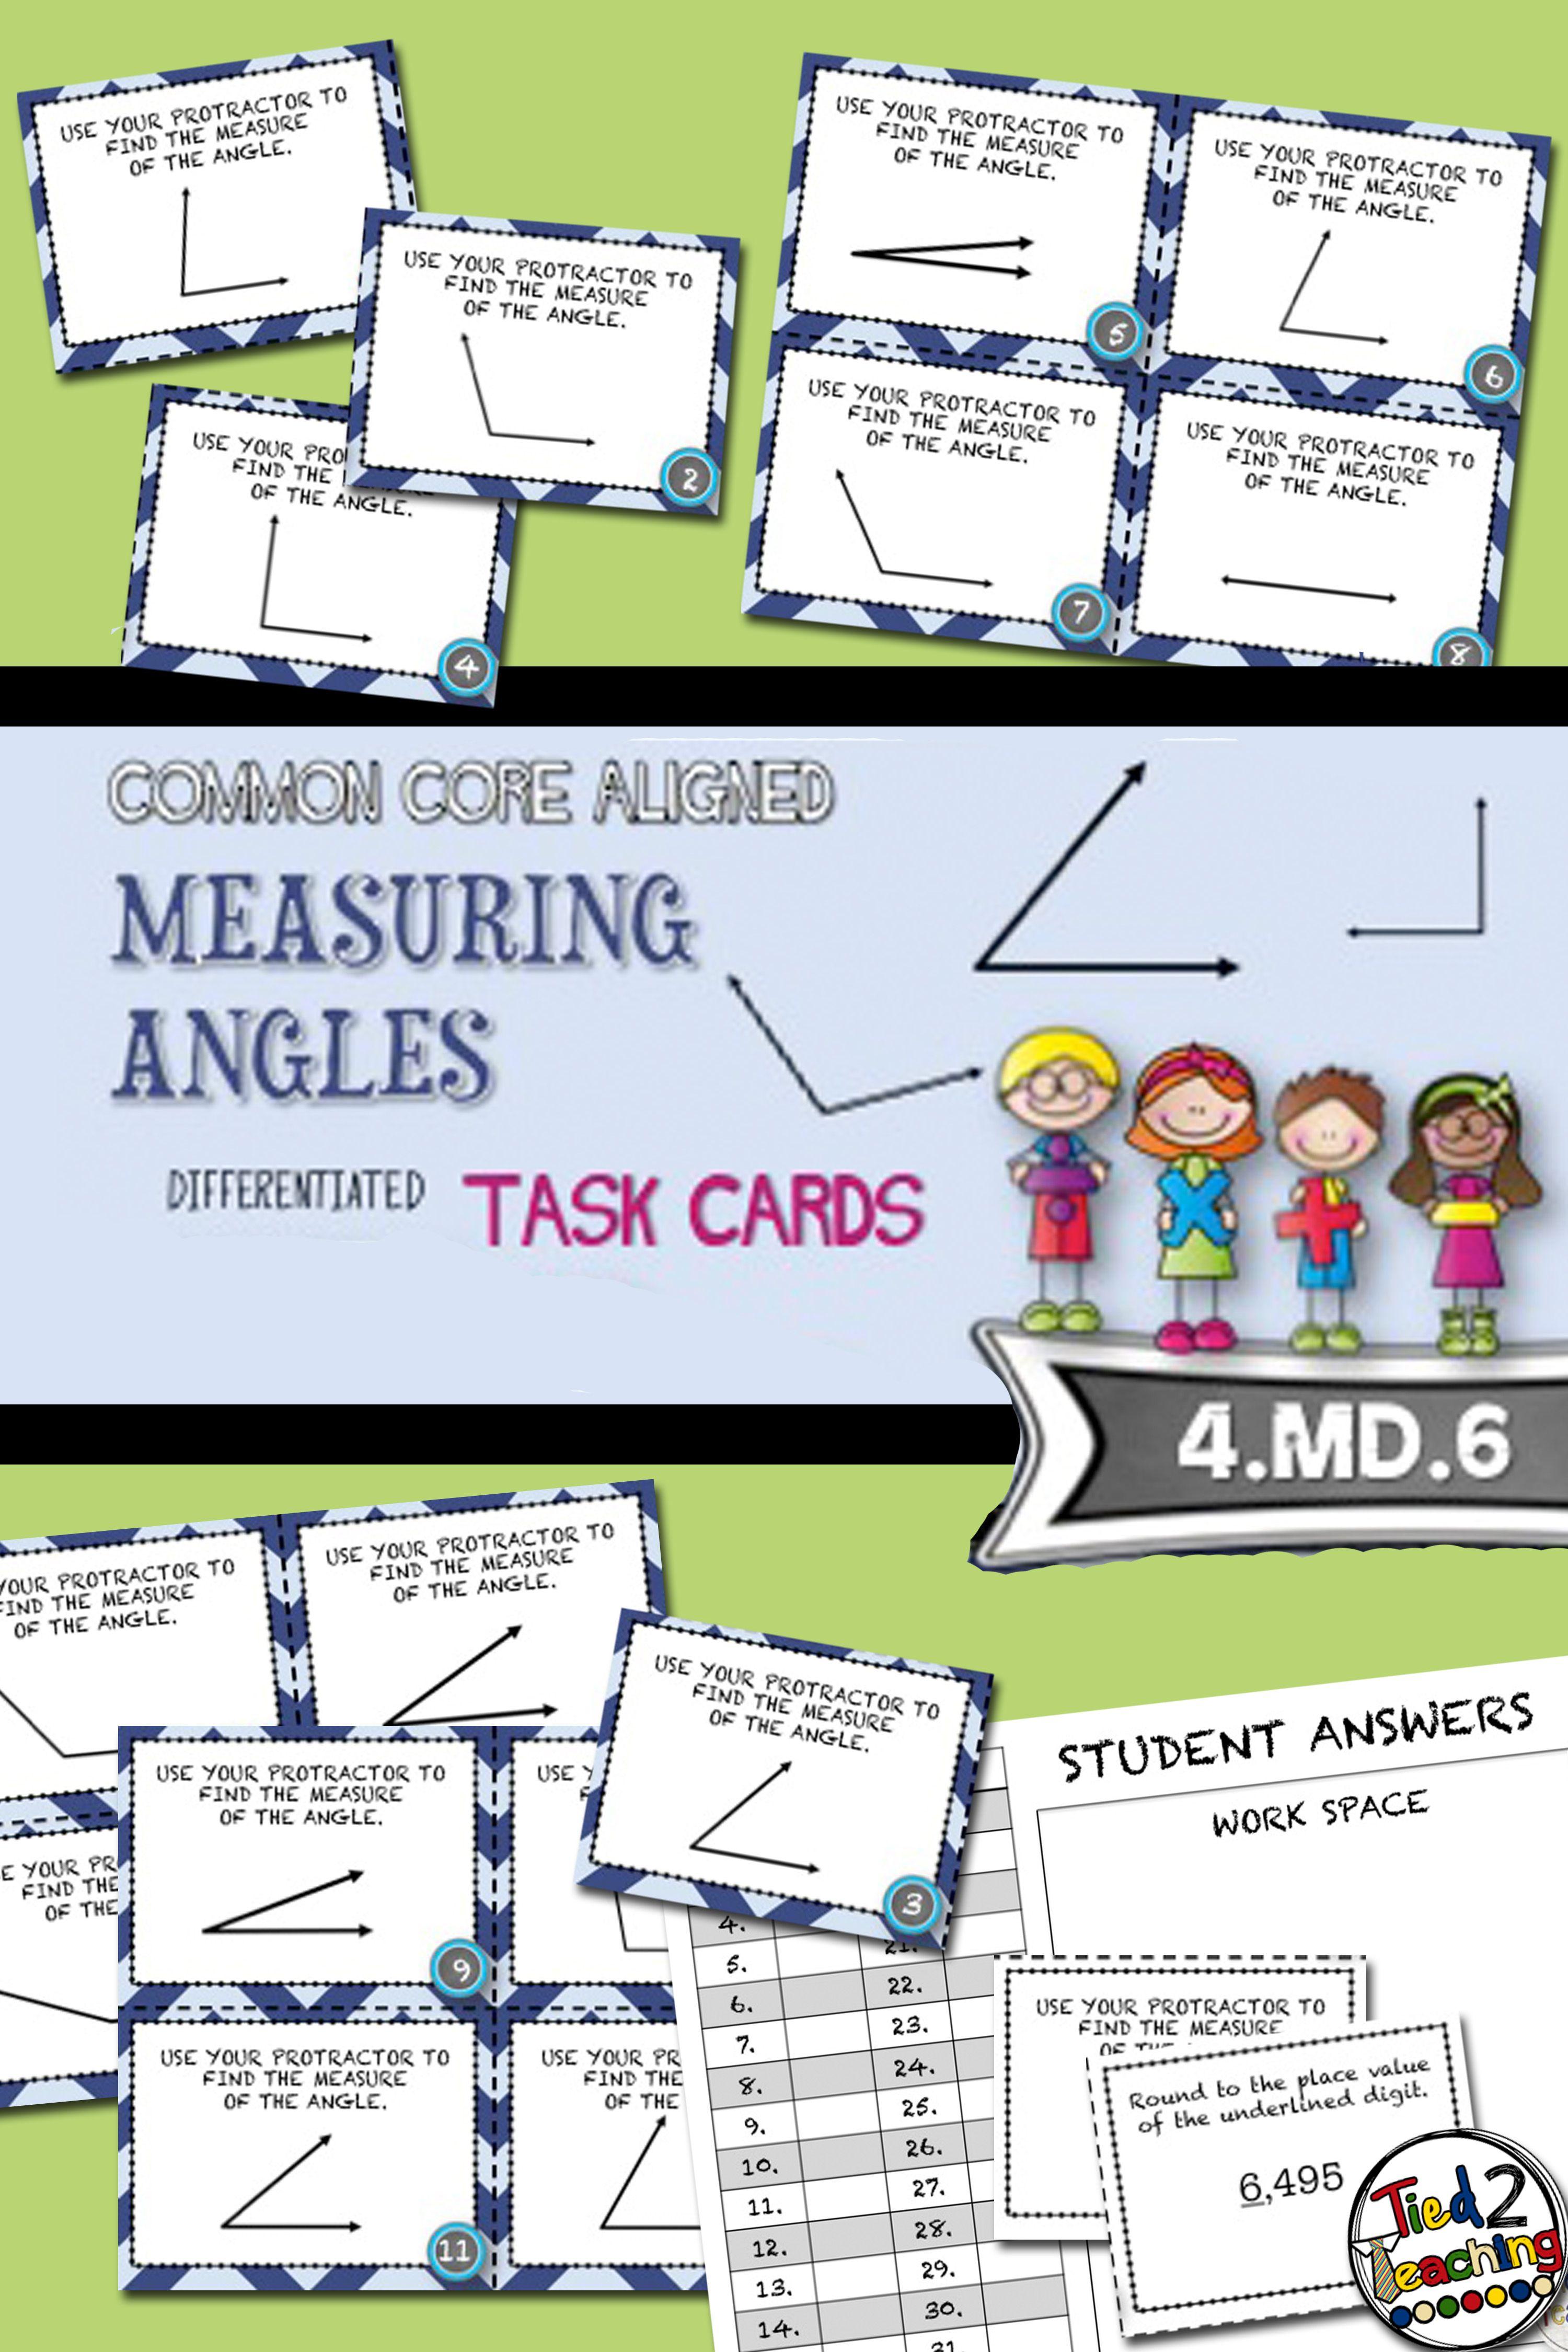 Measuring Angles Using A Protractor 20 Common Core